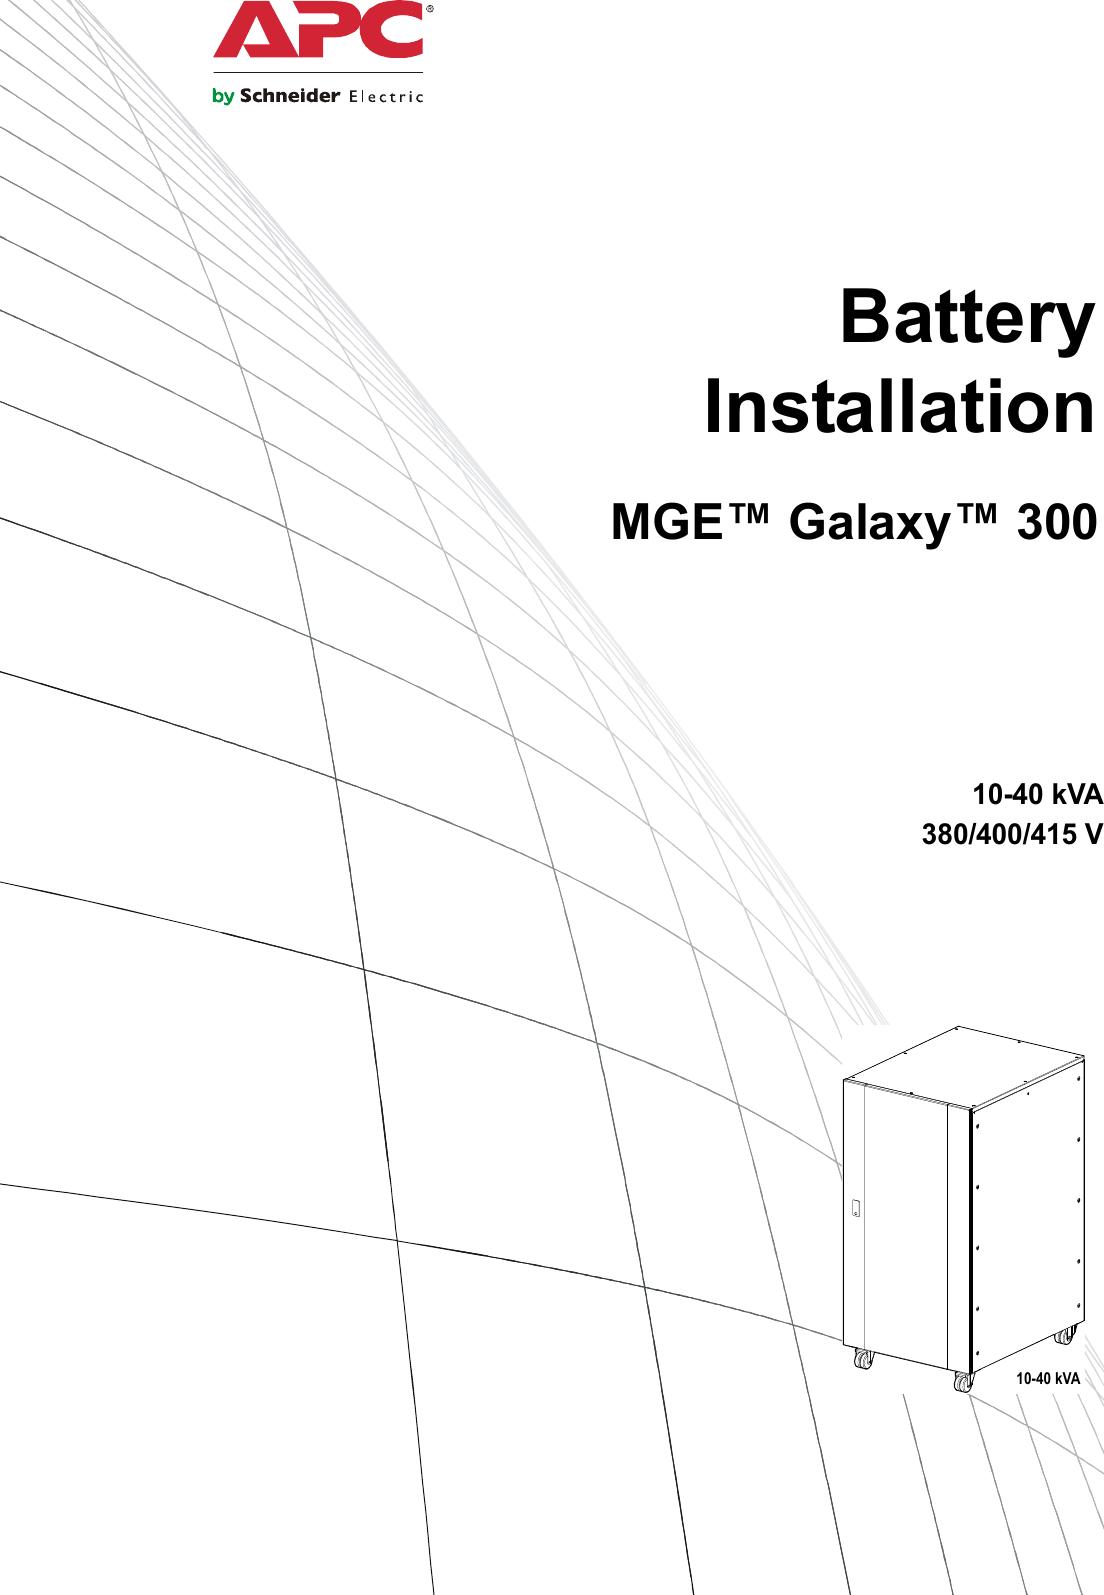 Apc Mge 300 Users Manual Ish 990 3617 15 Kva Ups Electrical Wiring Diagram